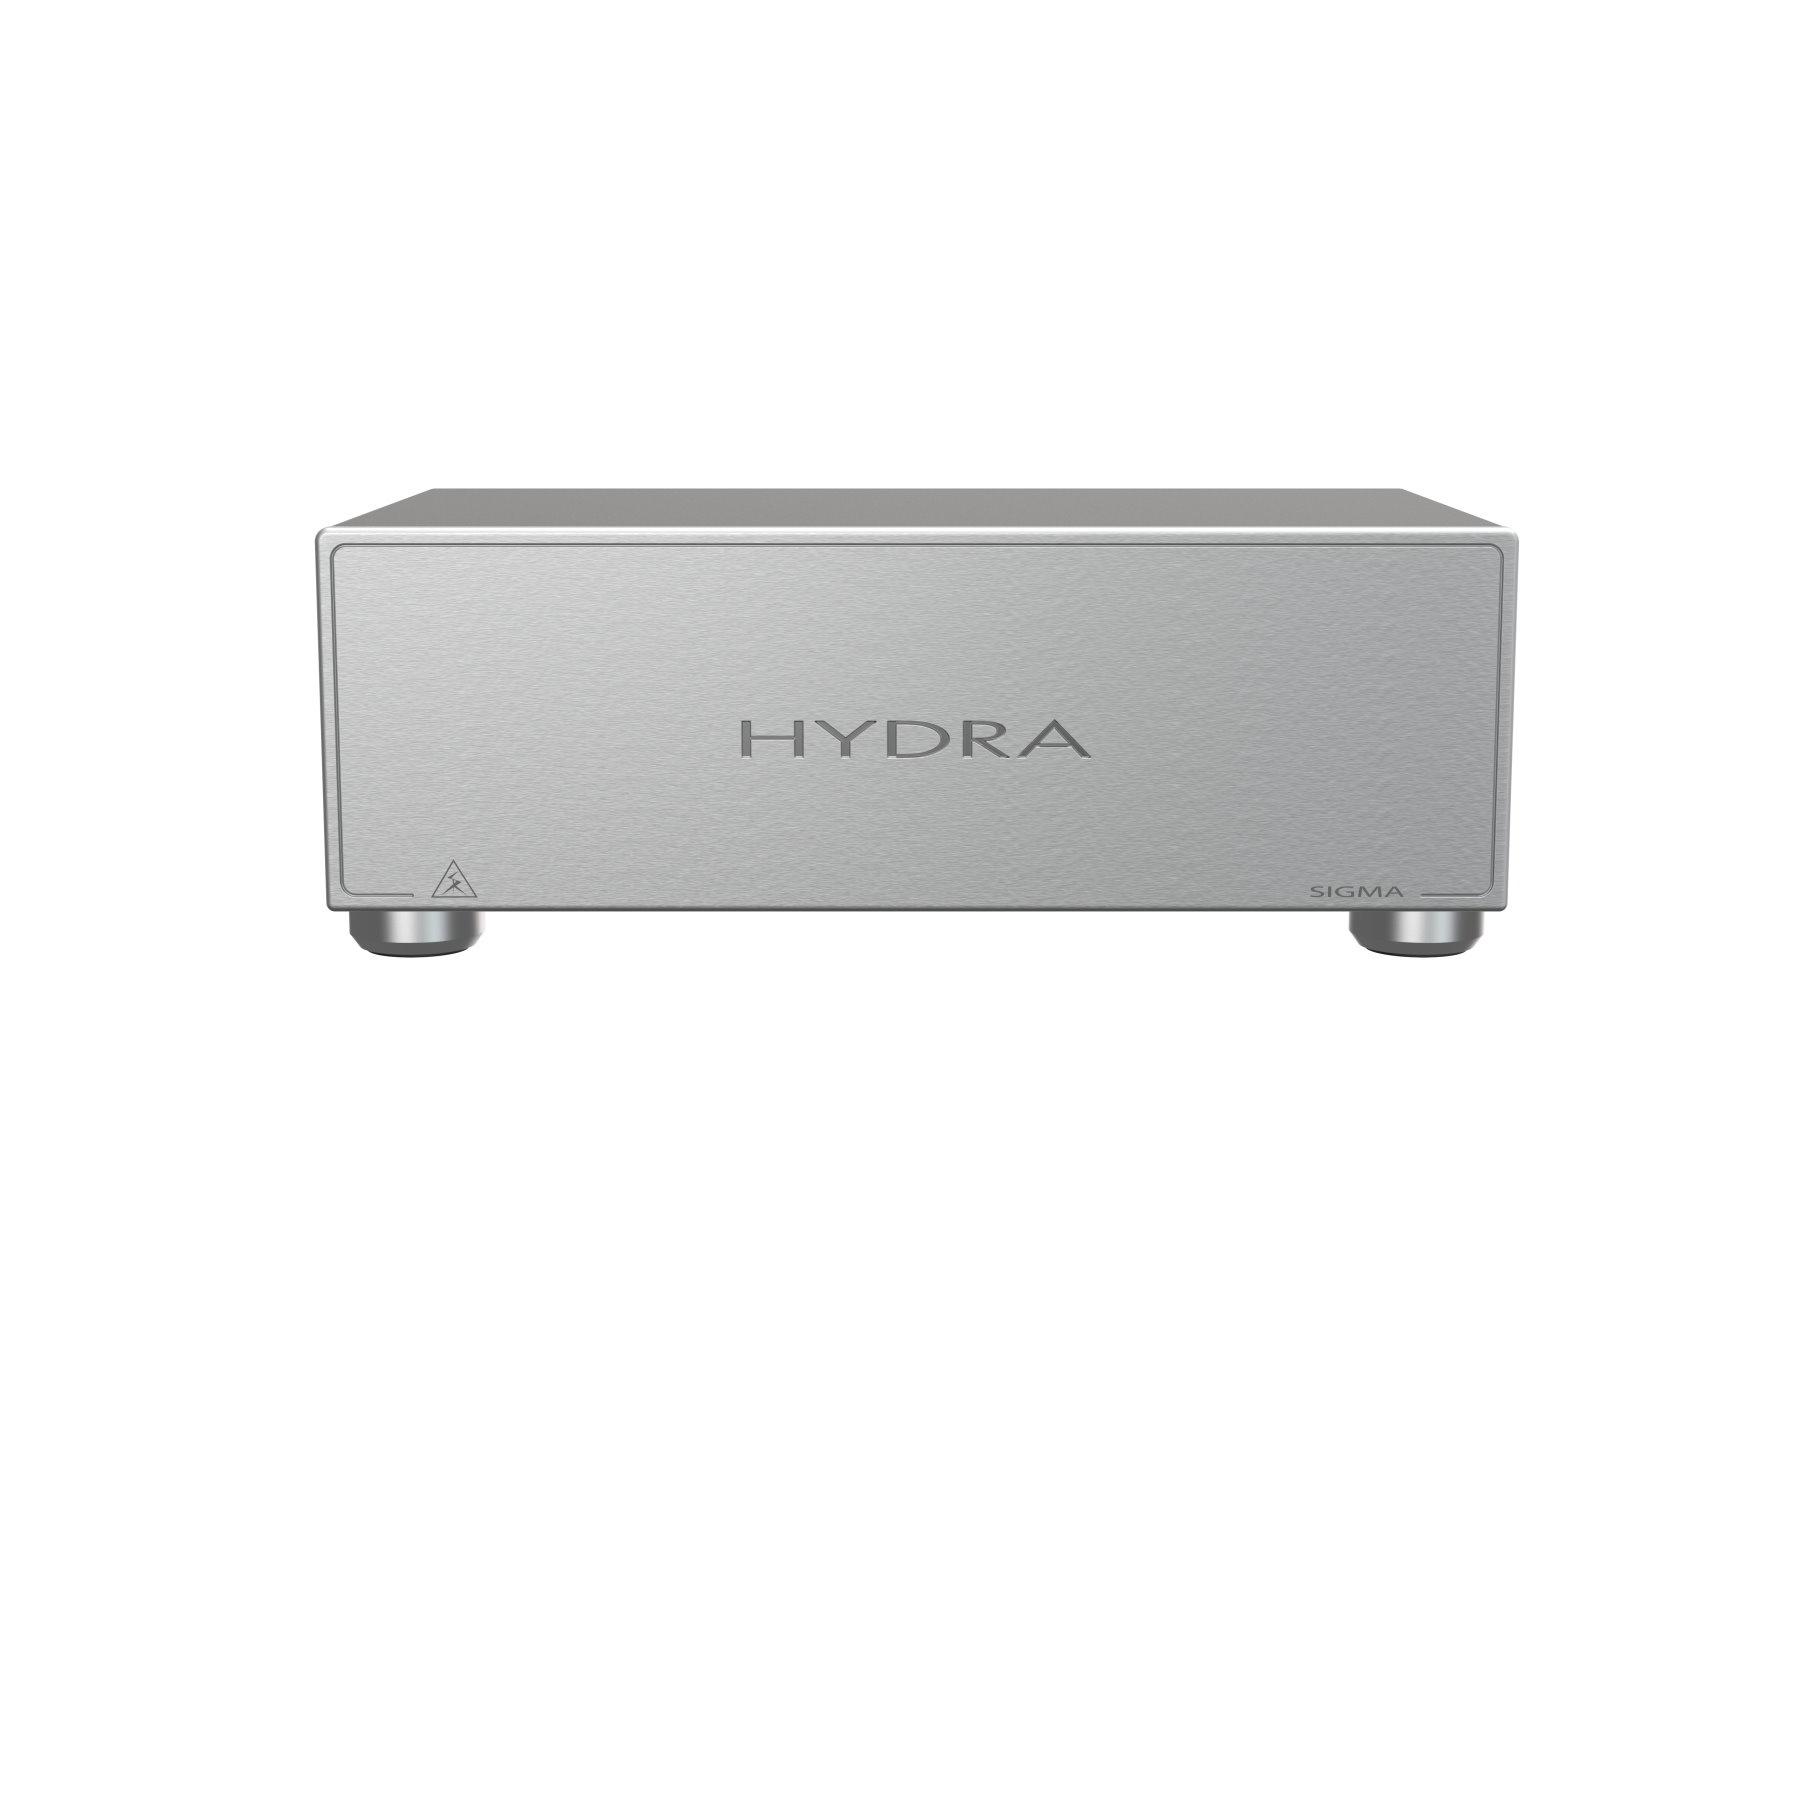 Shunyata Research Hydra Sigma S12 Power Distributor